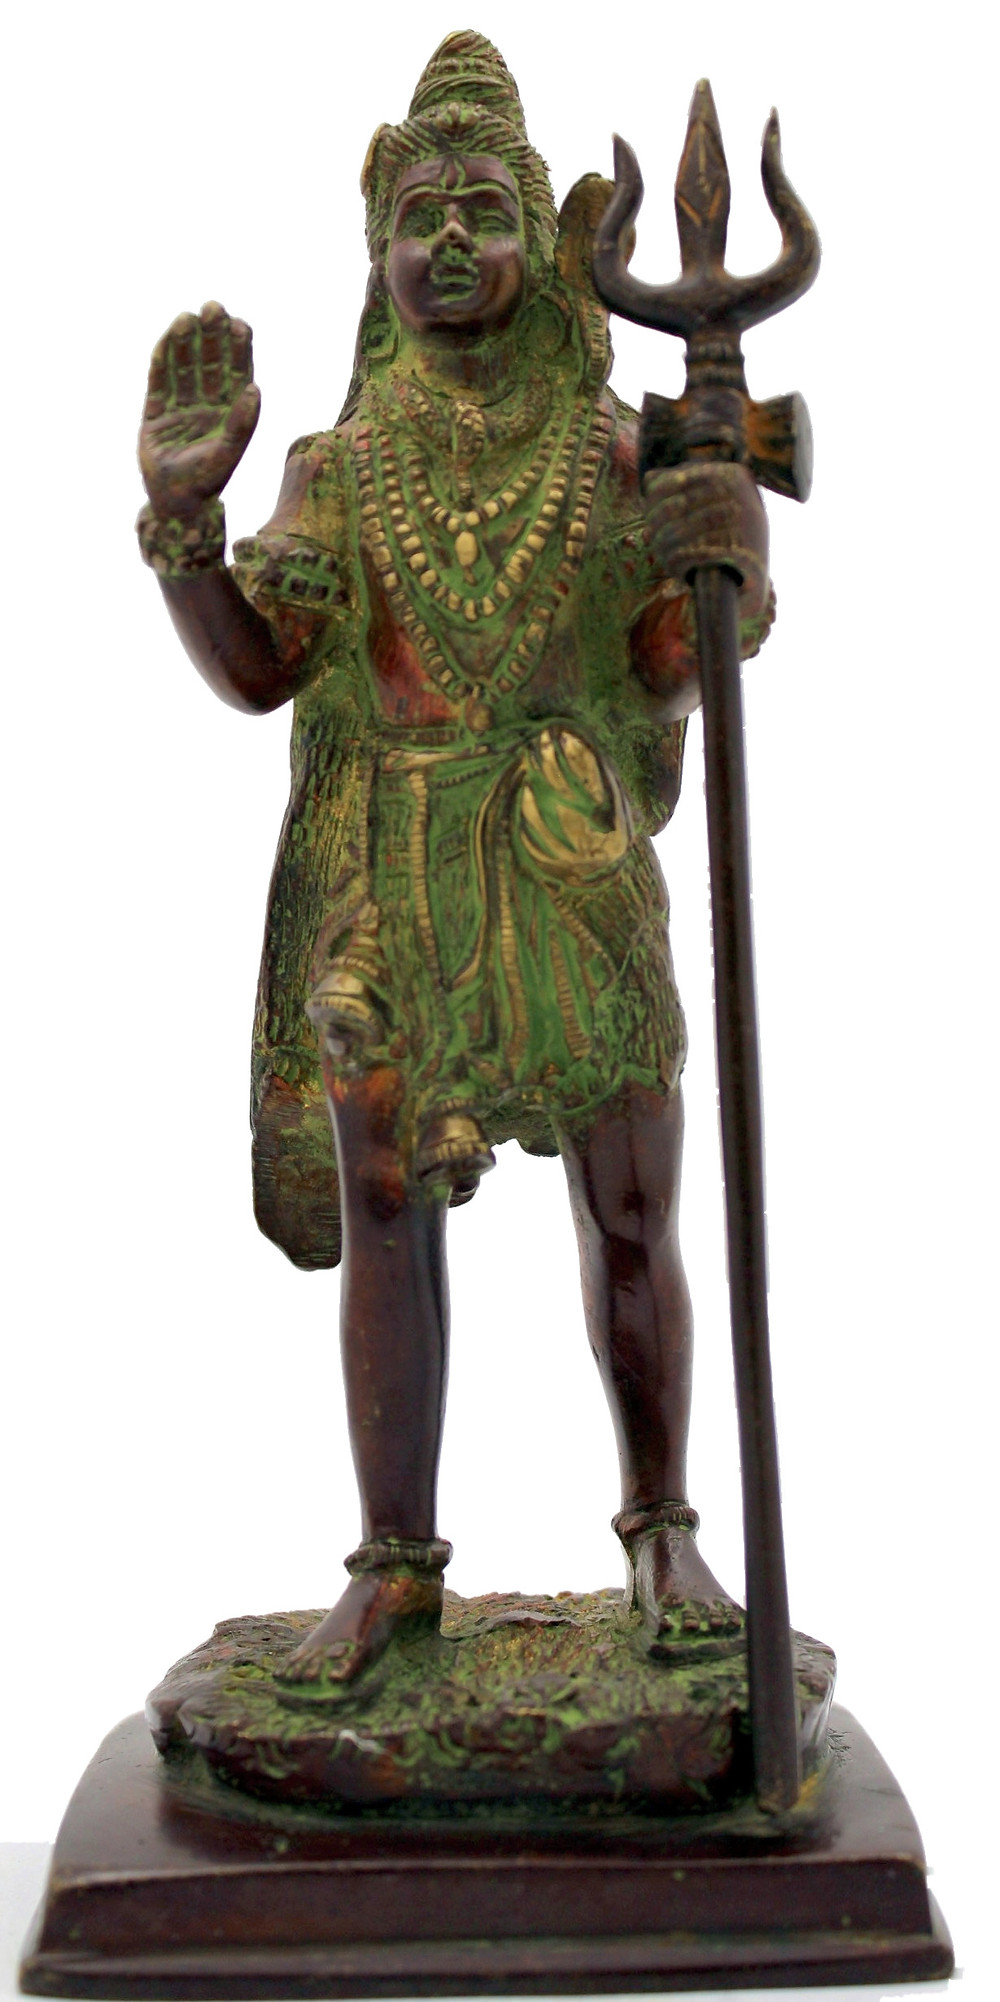 statue en bronze de Shiva  dieu hindou